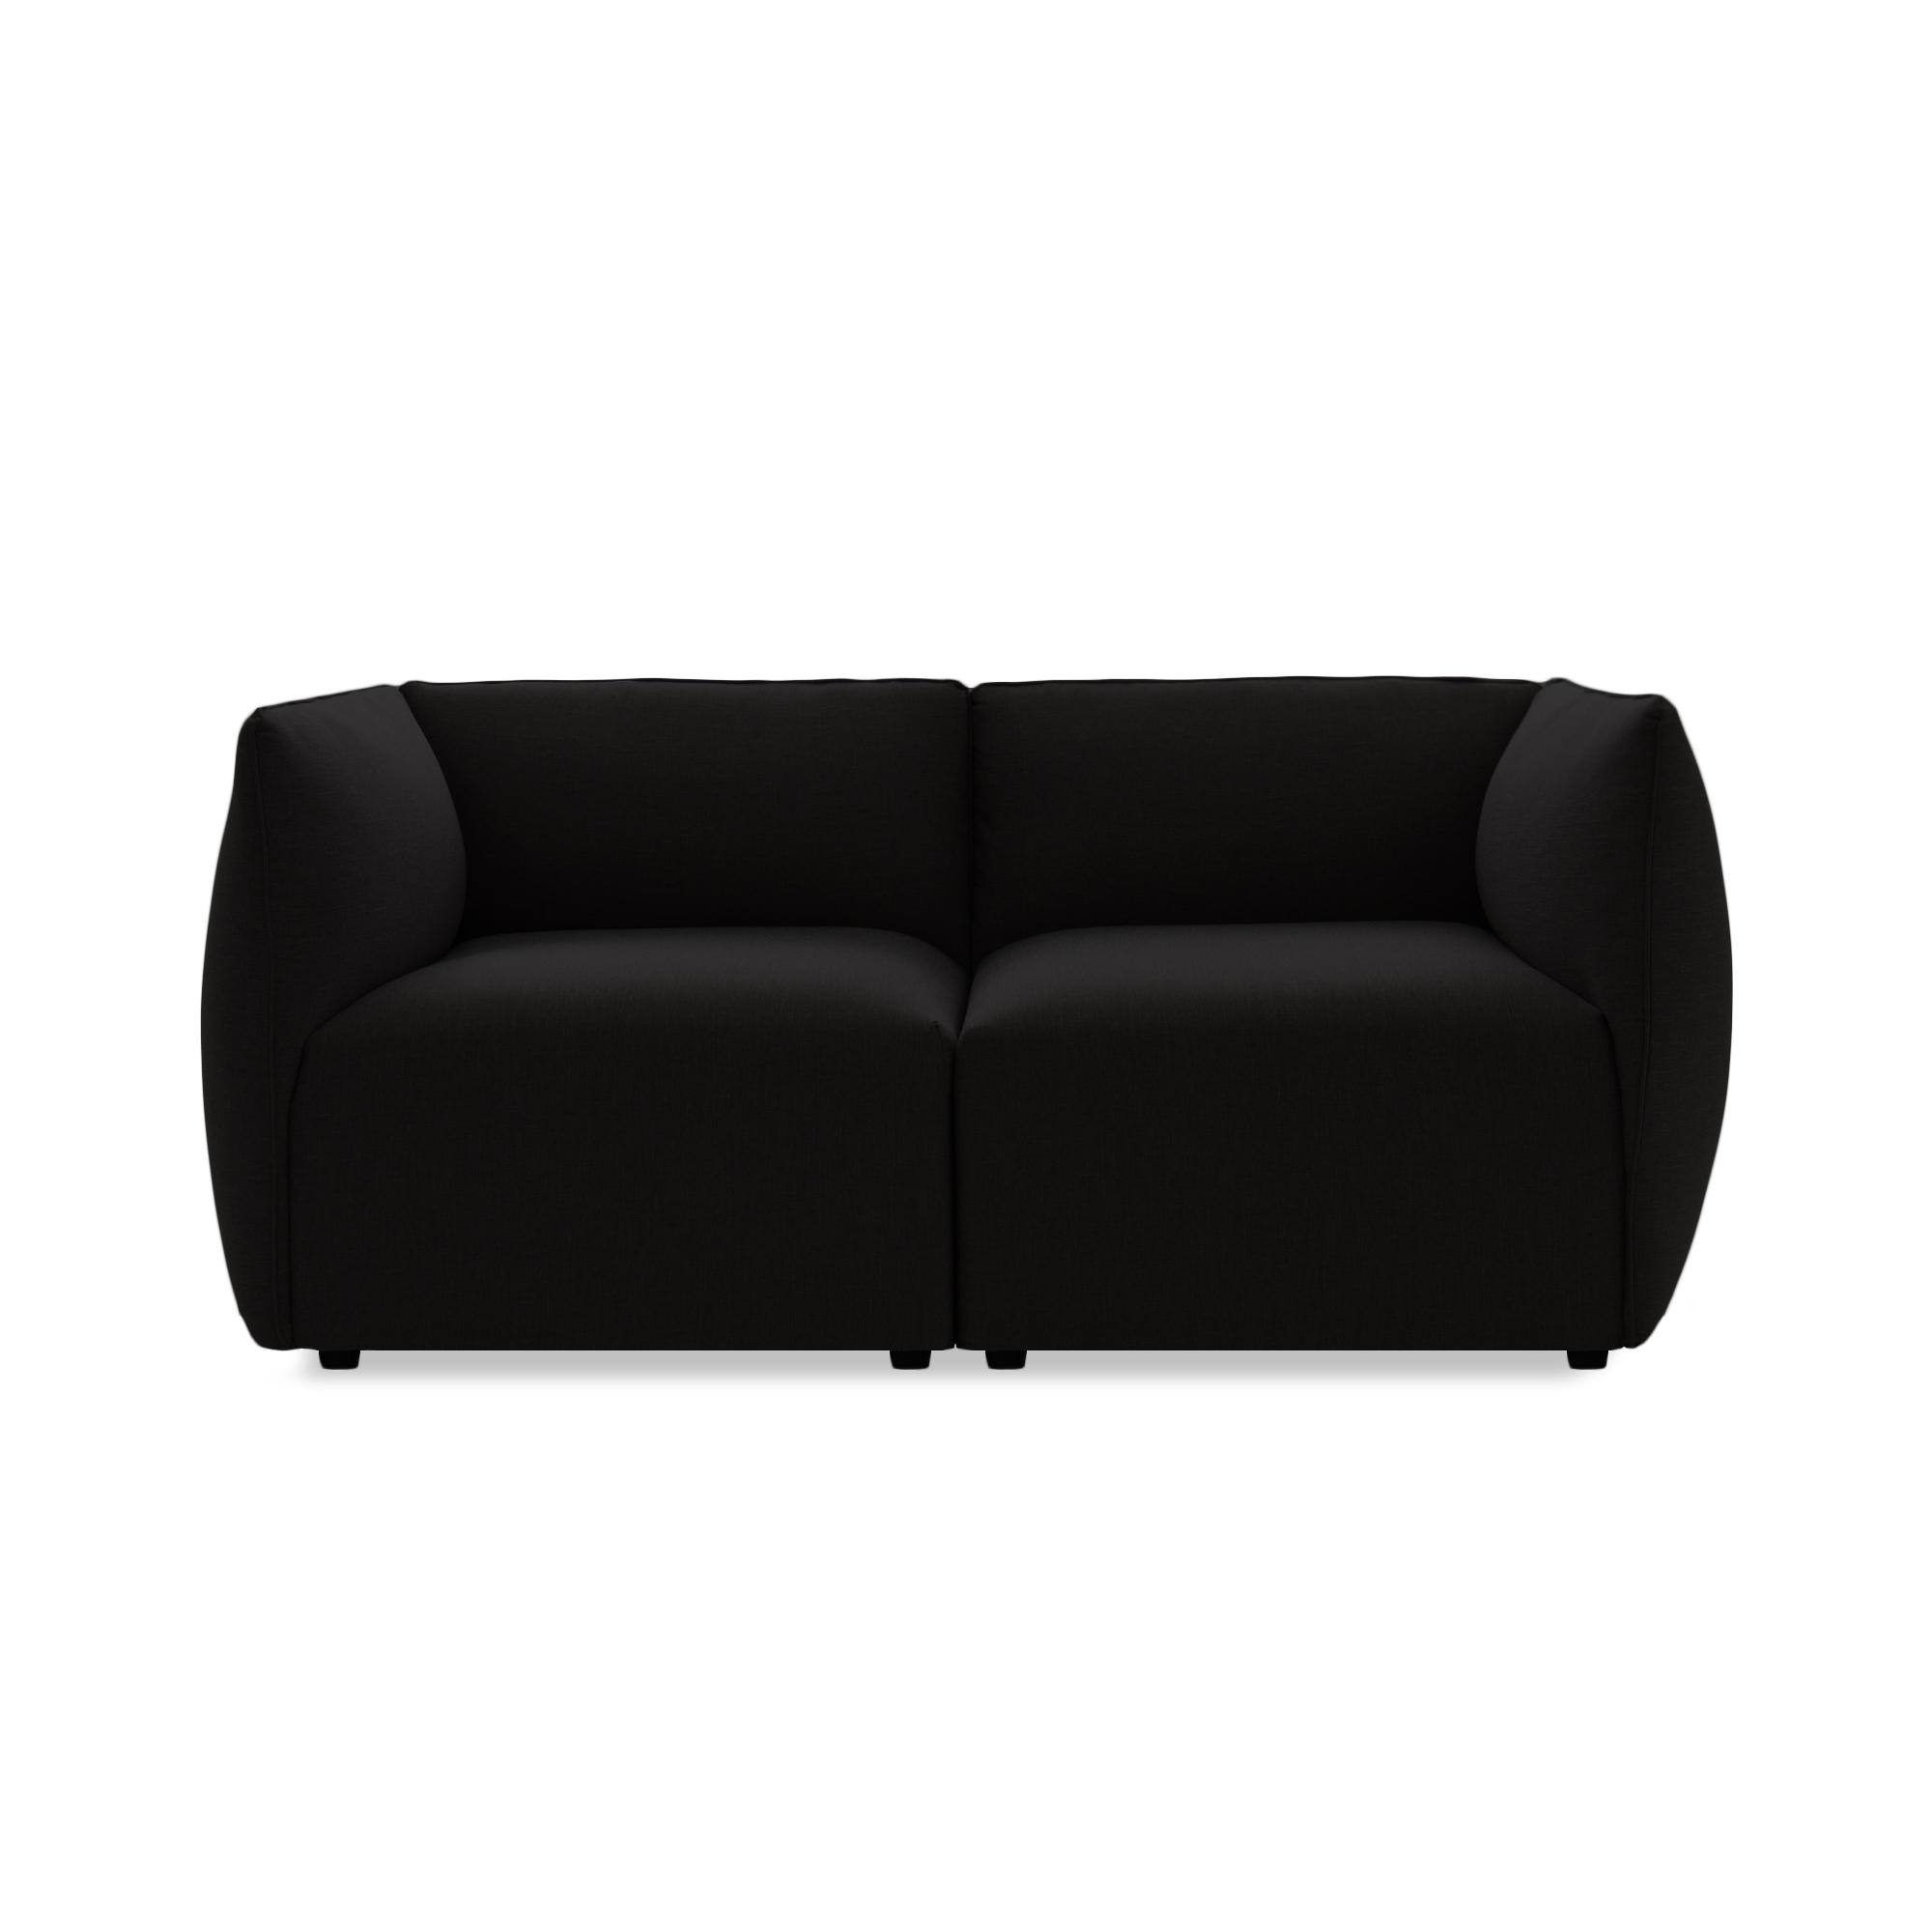 Canapea Fixa 2 locuri Cube Dark Brown